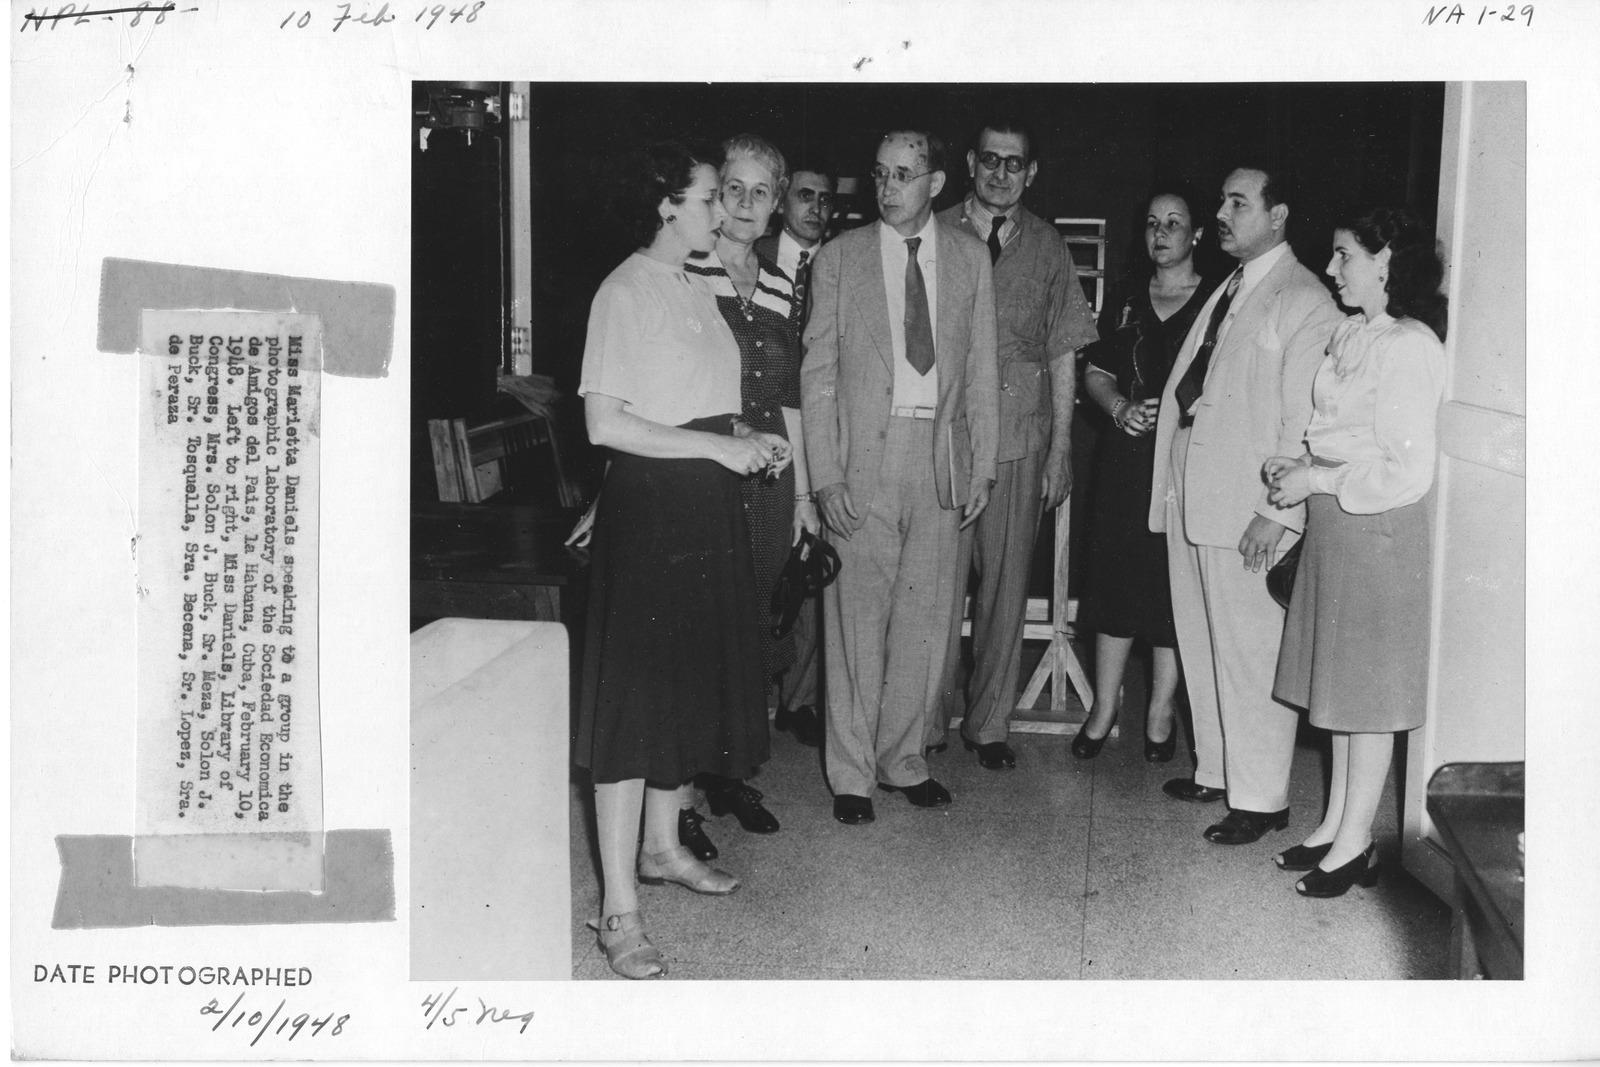 Photograph of Miss Marietta Daniels Speaking to a Group in the Photographic Laboratory of the Sociedad Economica de Amigos del Pats, La Habana, Cuba